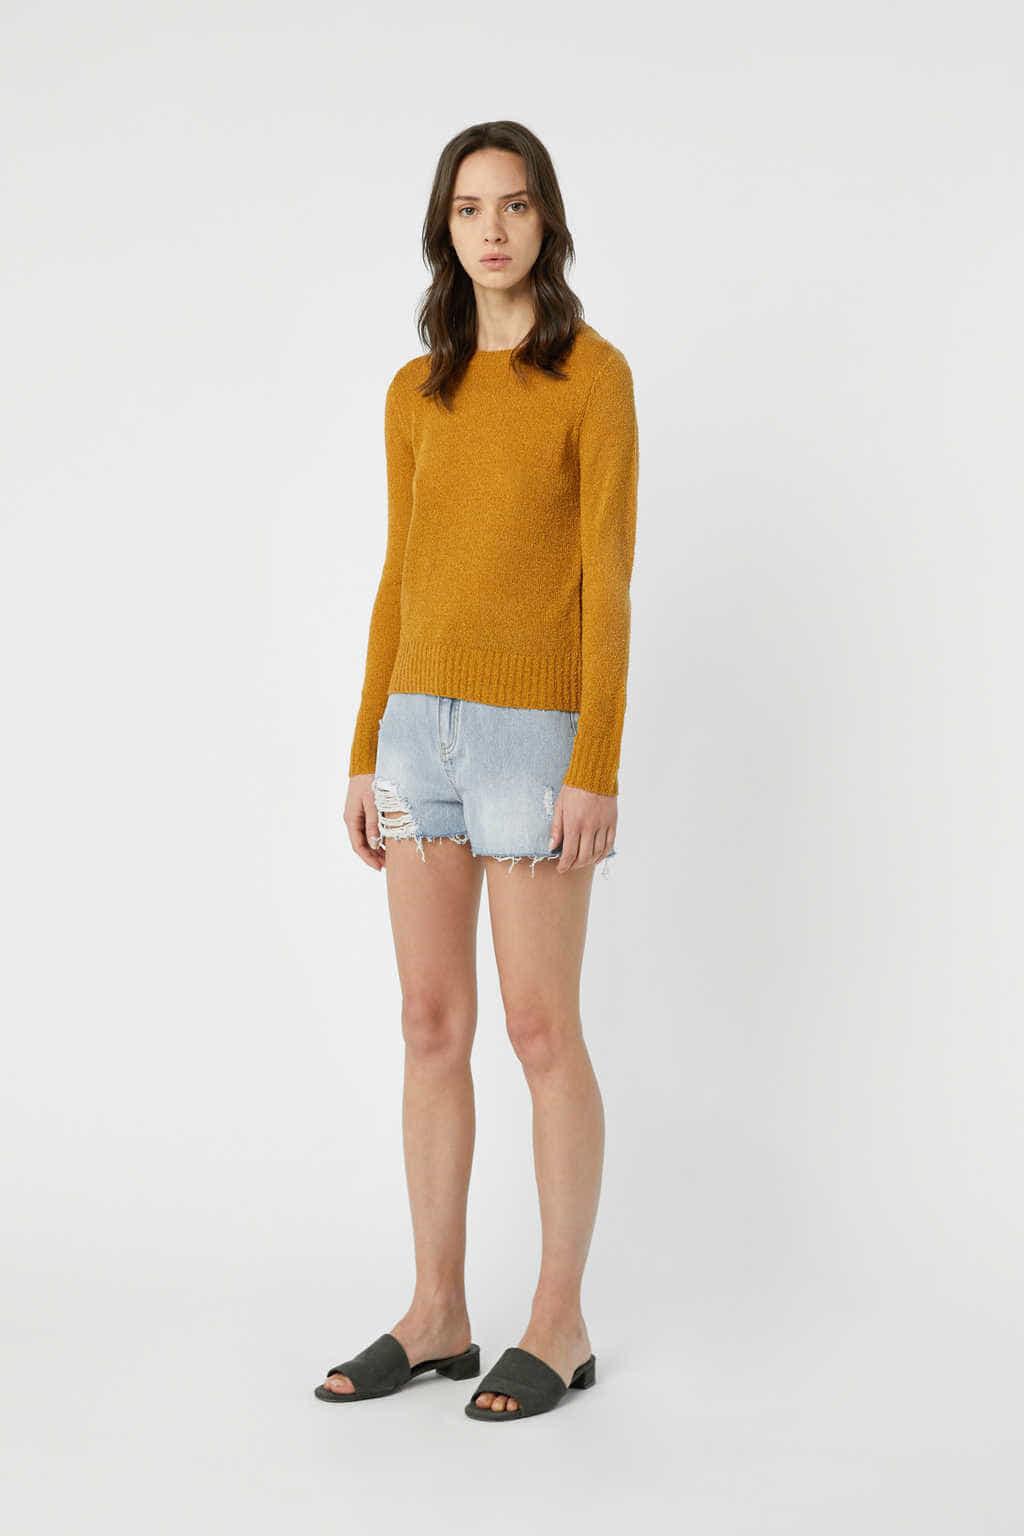 Sweater 3376 Mustard 3